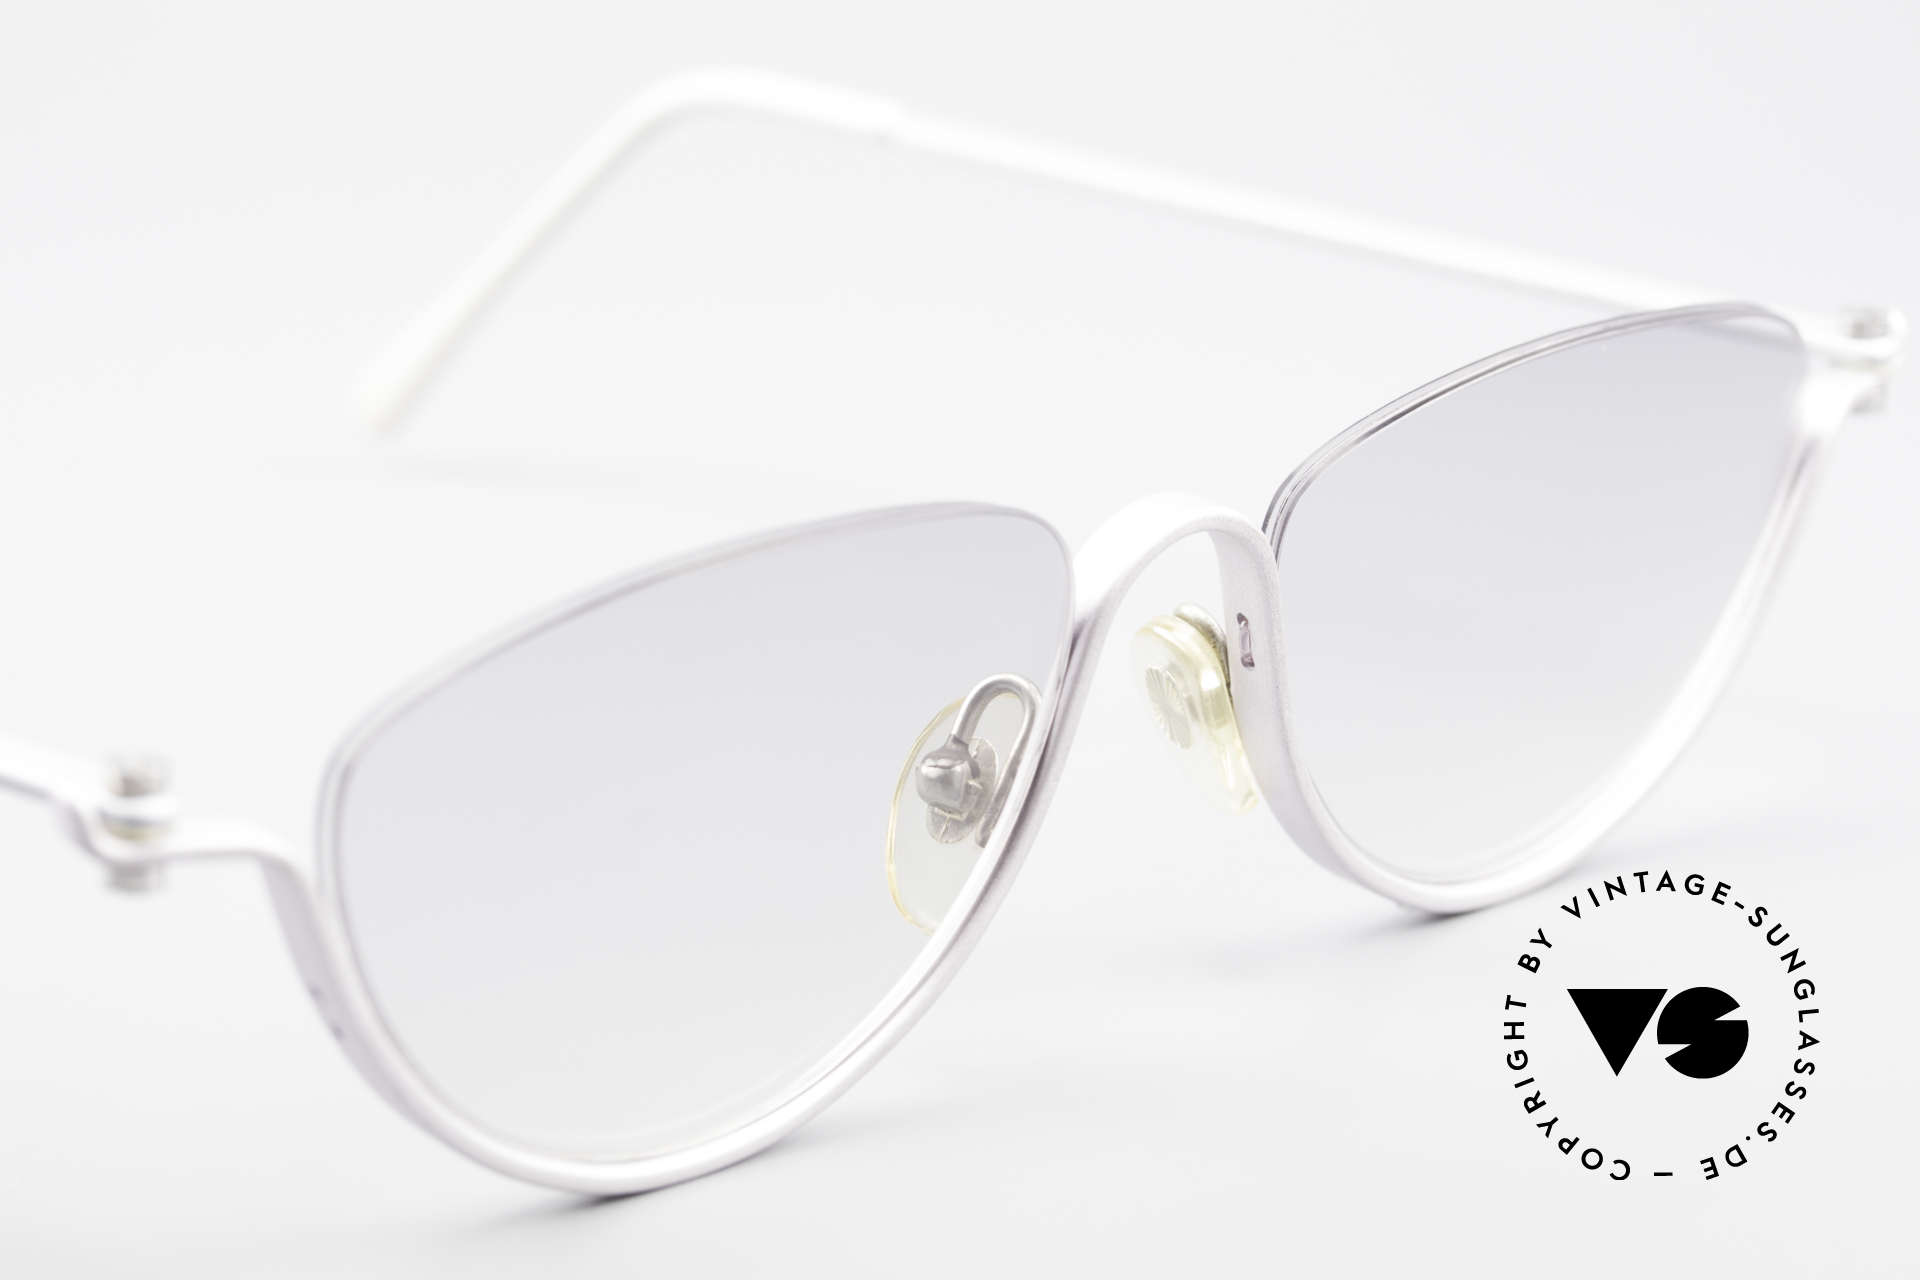 ProDesign No10 Gail Spence Design Sunglasses, ultra RARE designer sunglasses from the mid 1990's, Made for Women